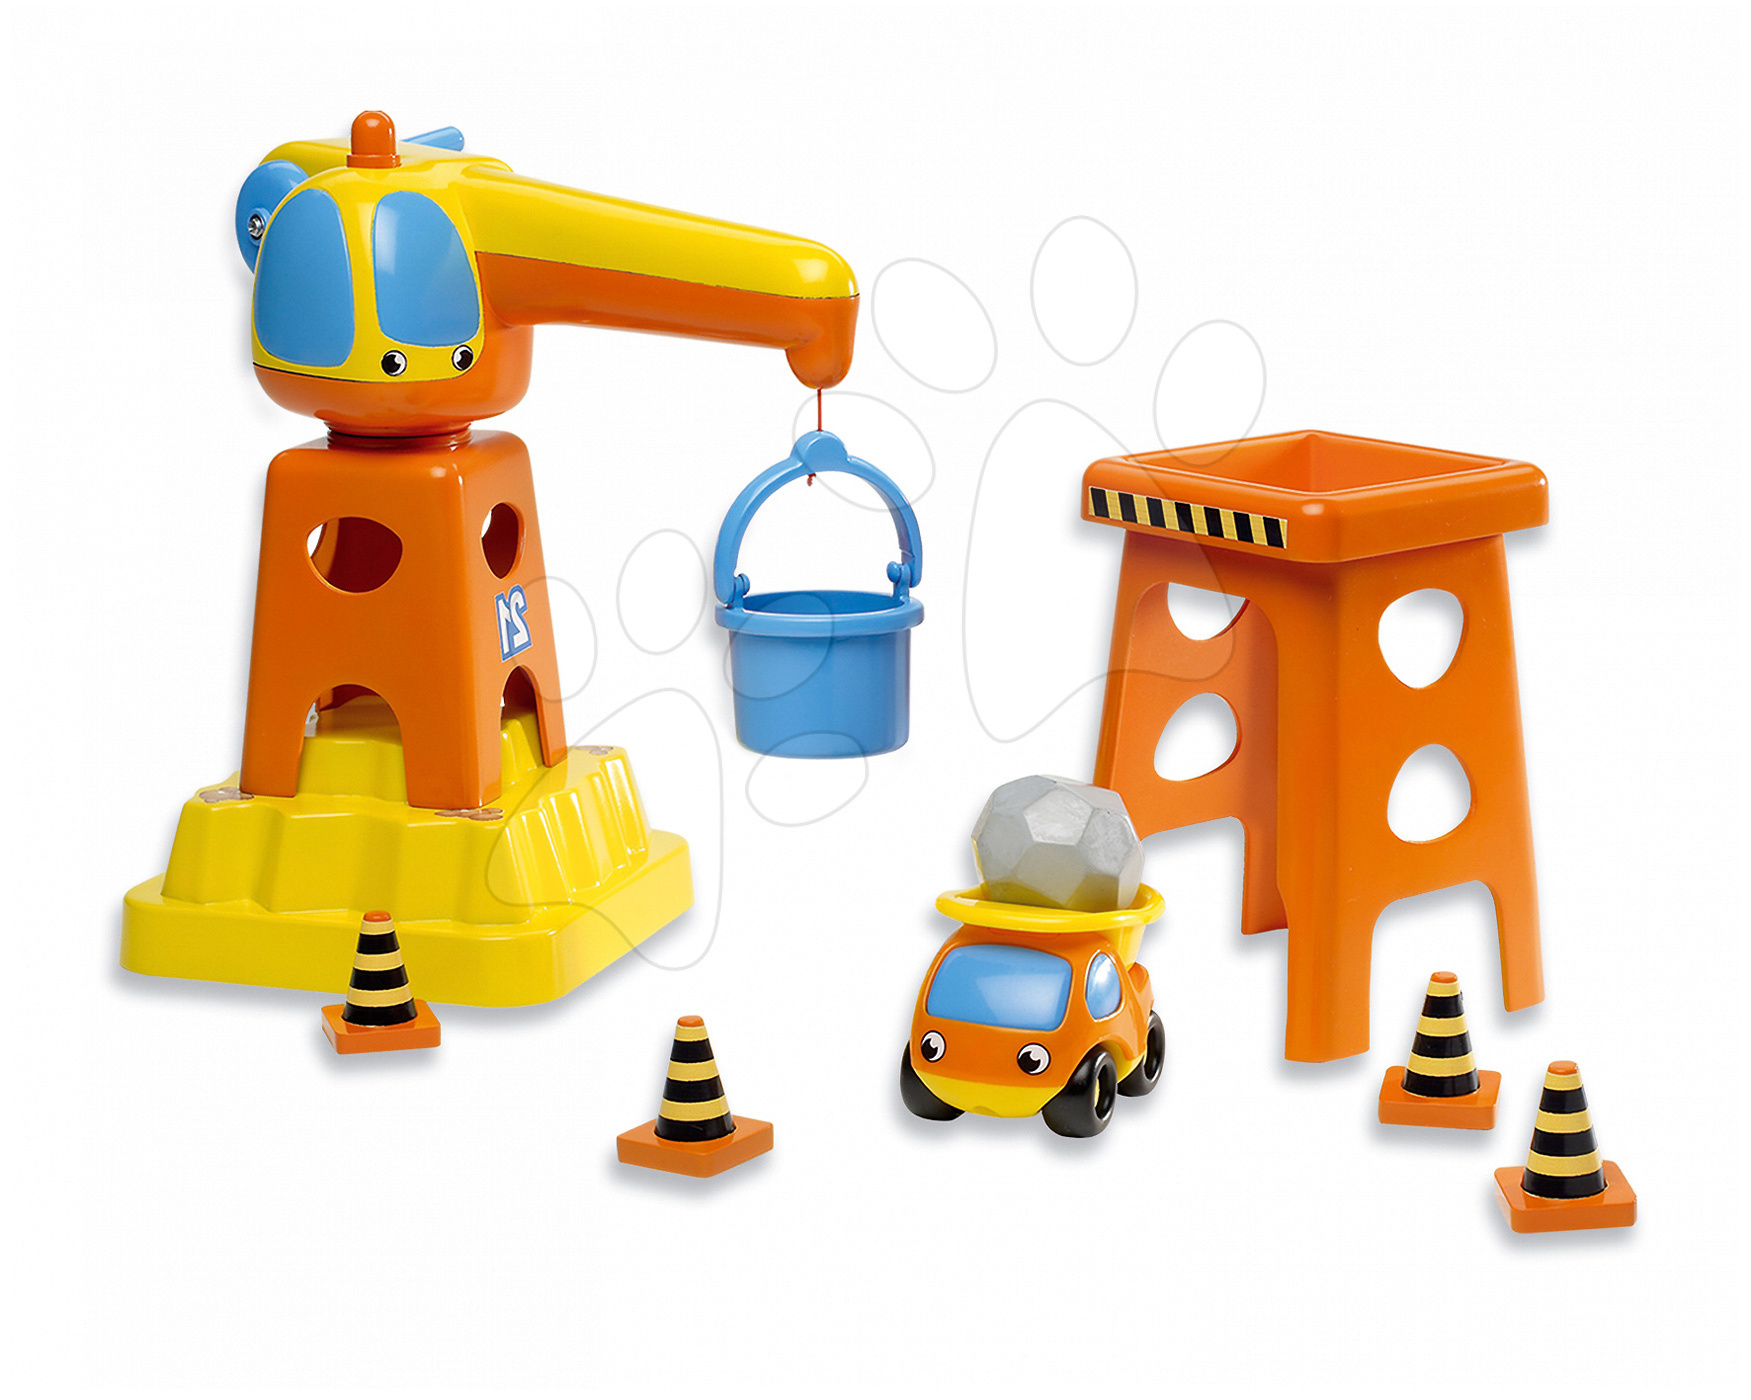 Utilaje construcție de jucărie - Set de construcție Vroom Planet Smoby de dimensiune medie de la 12 luni